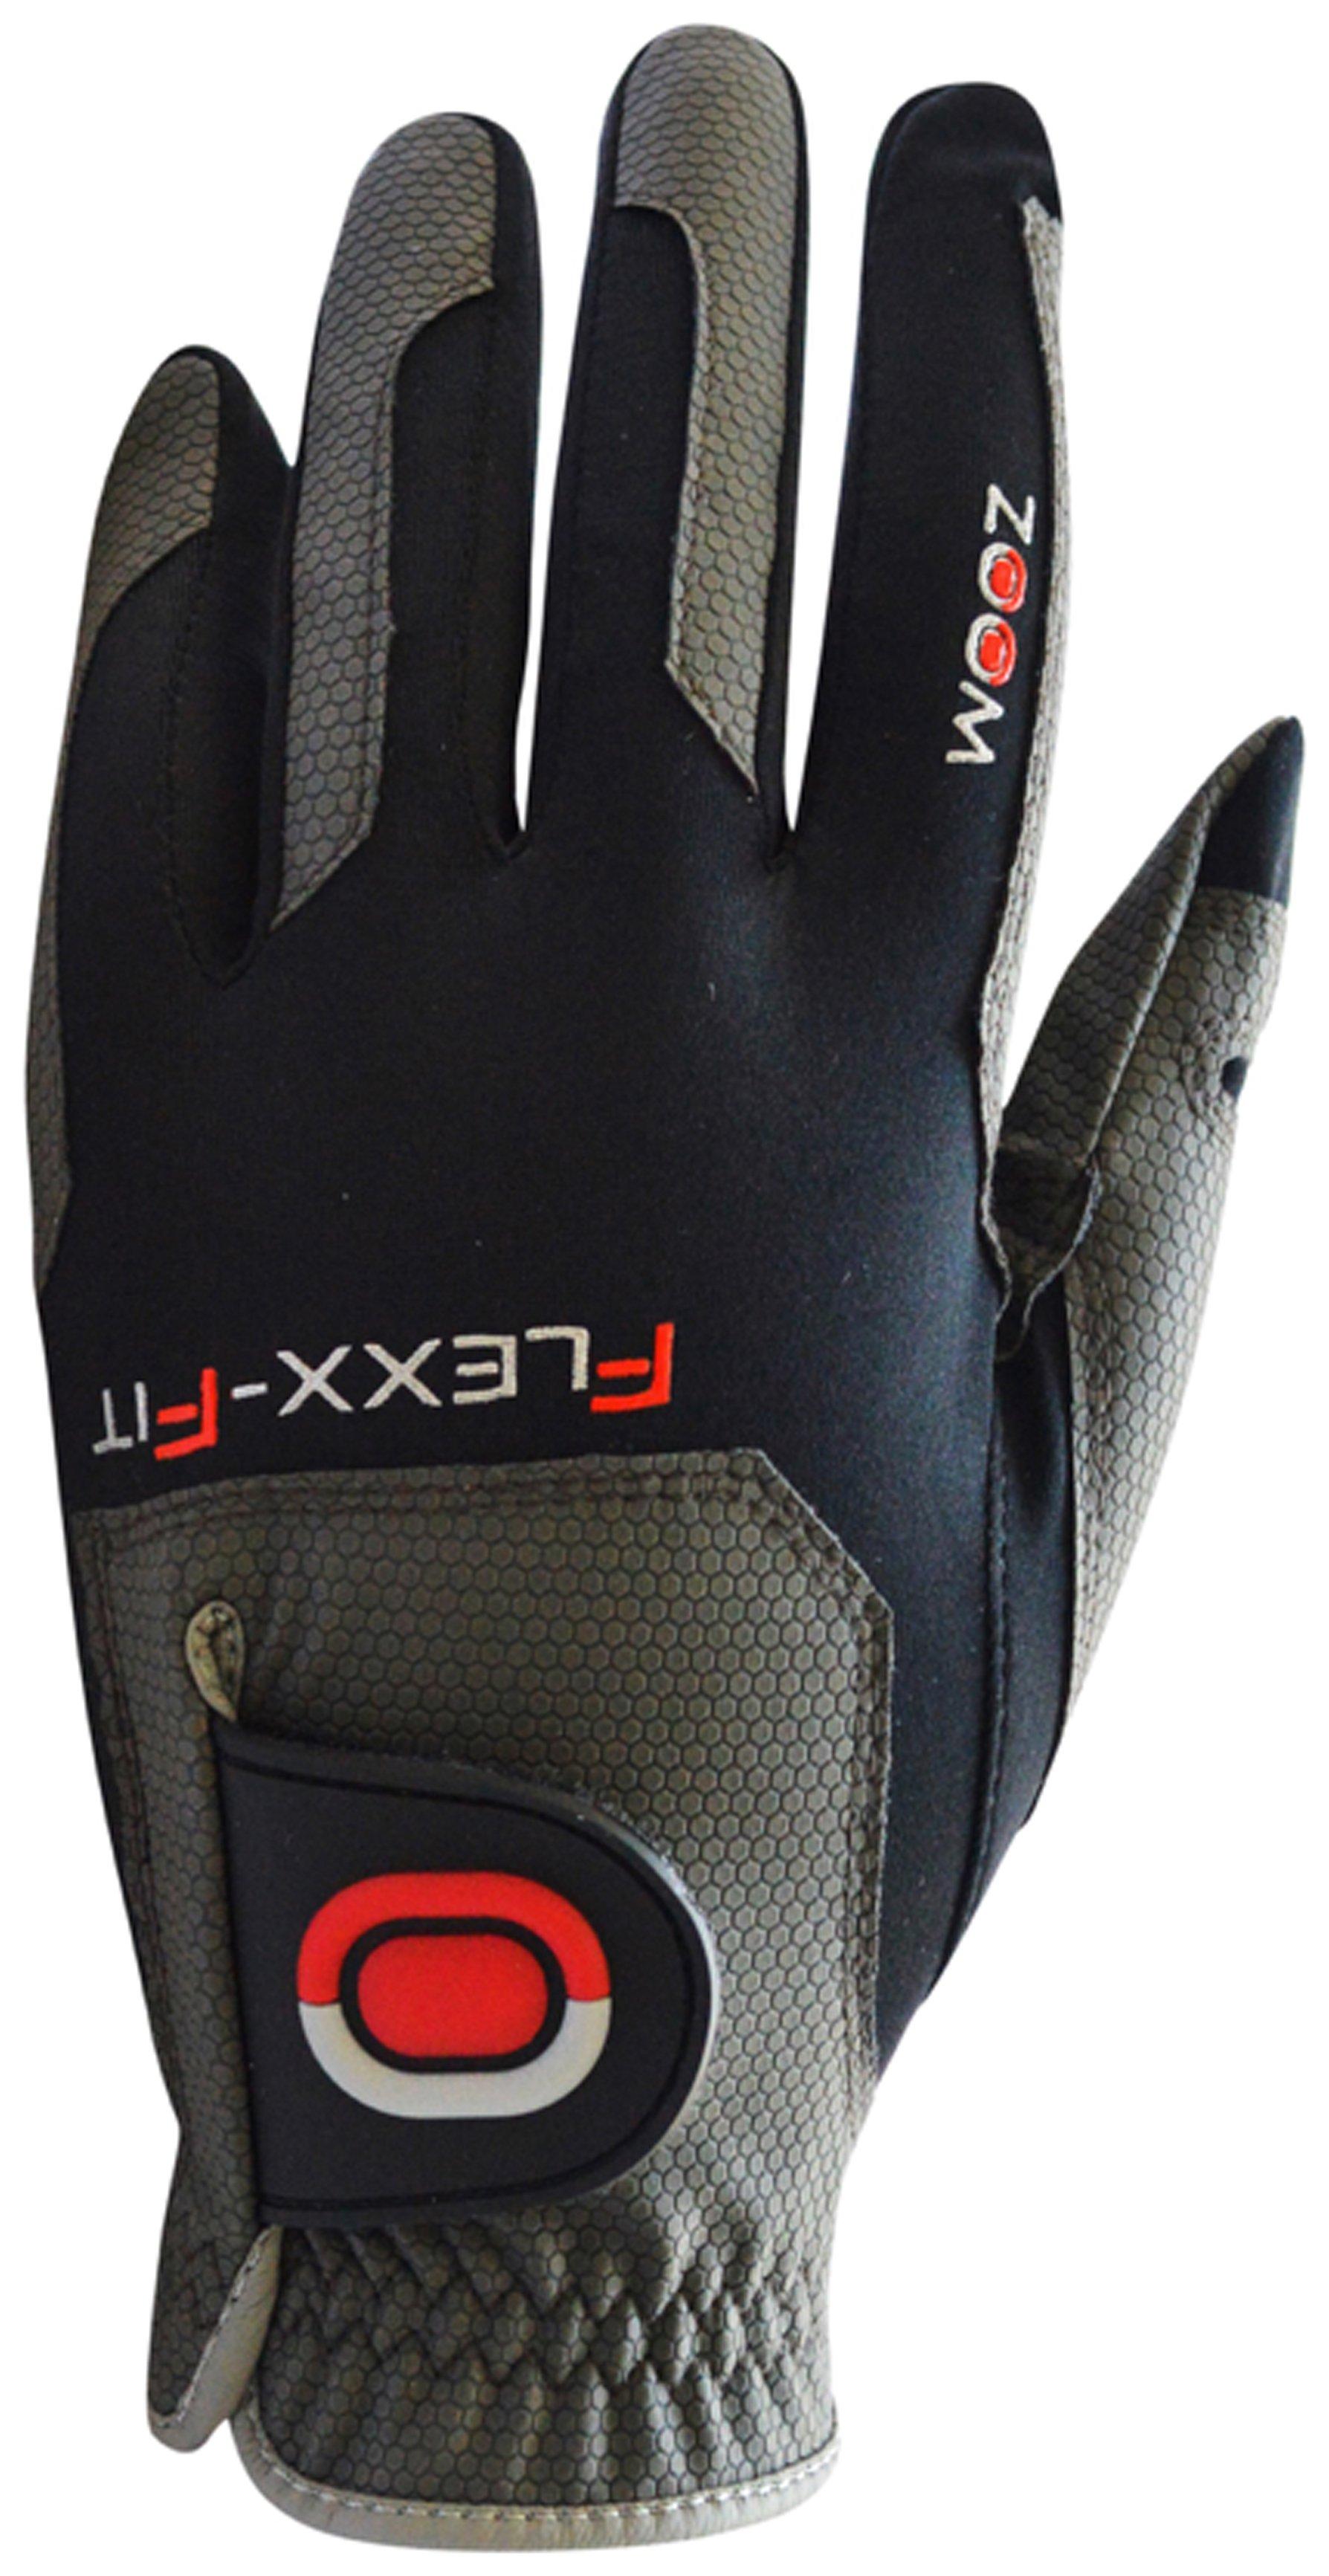 Zoom All Weather Golf Glove